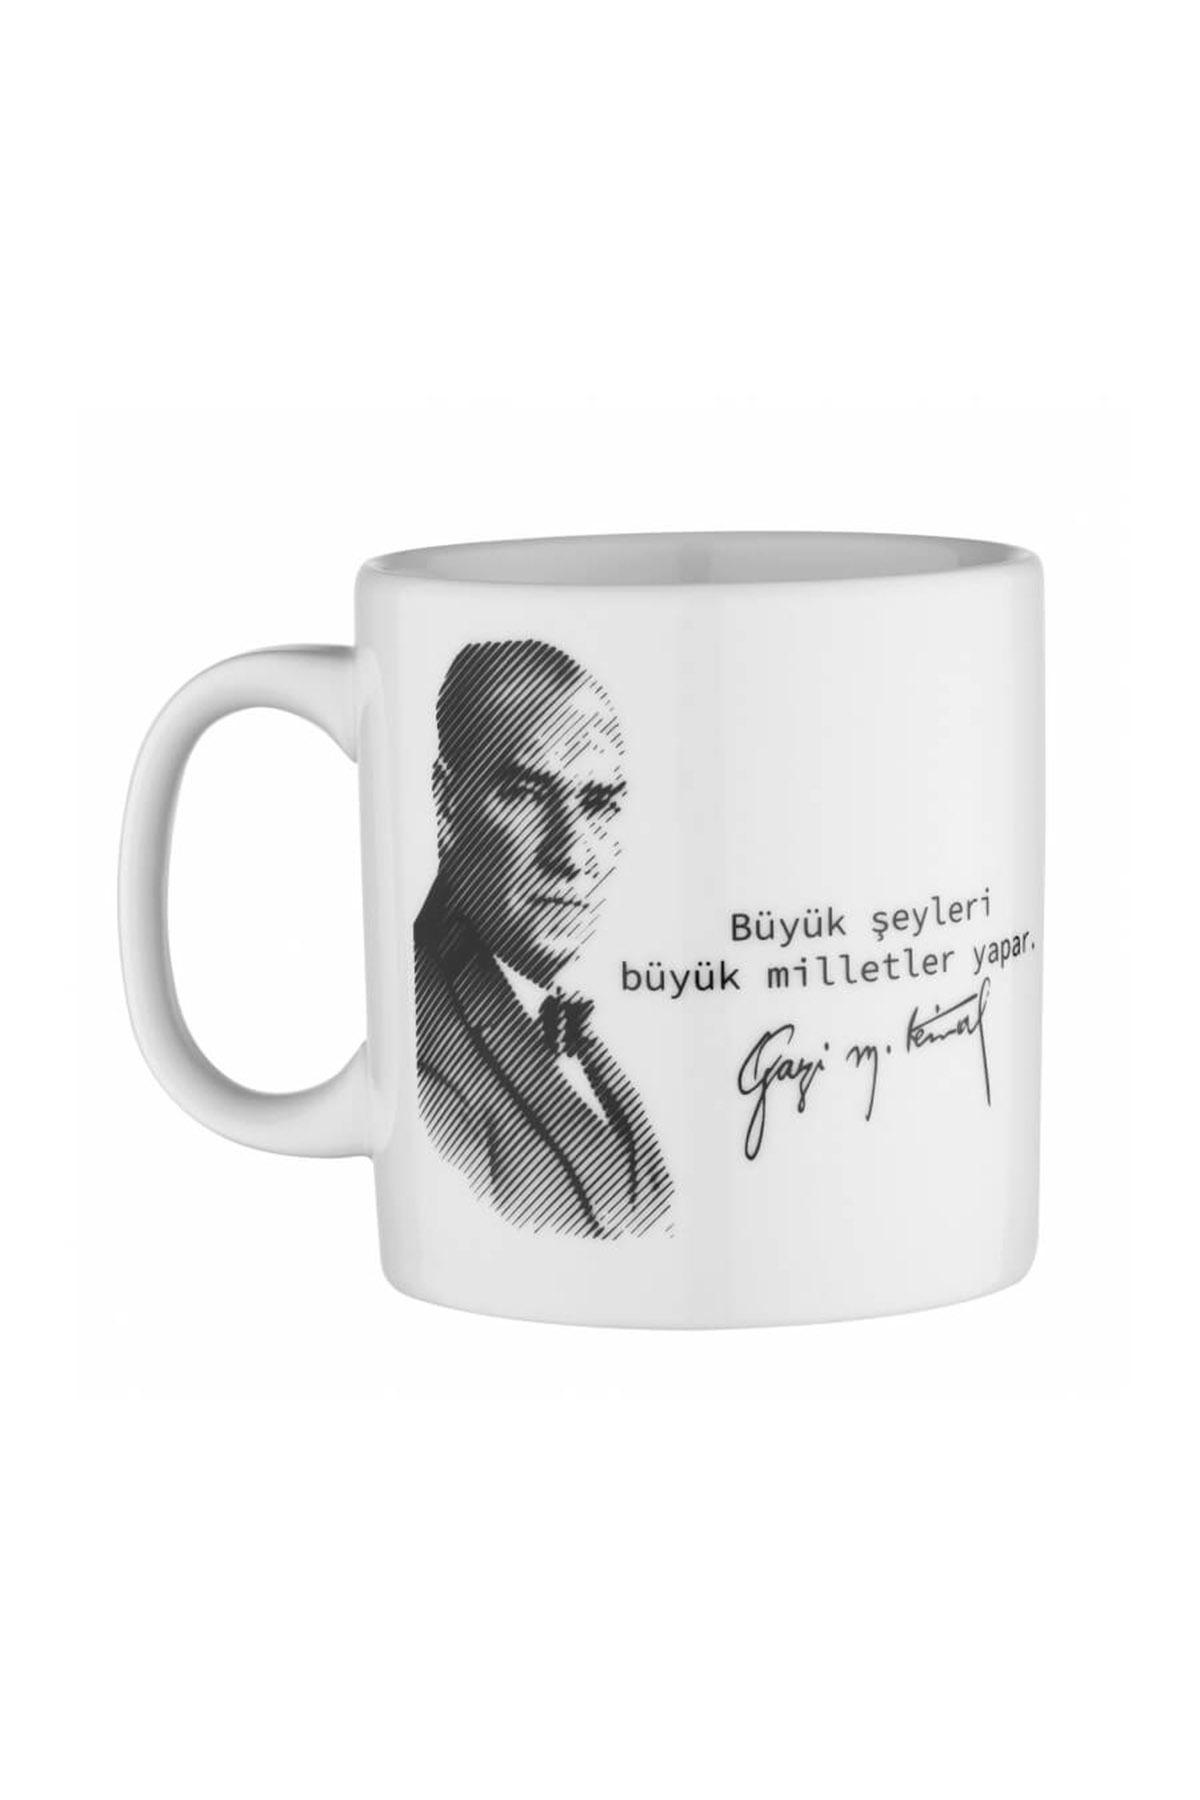 KÜTAHYA PORSELEN - Kütahya Porselen Mug Bardak Special Coll. Atatürk 10429